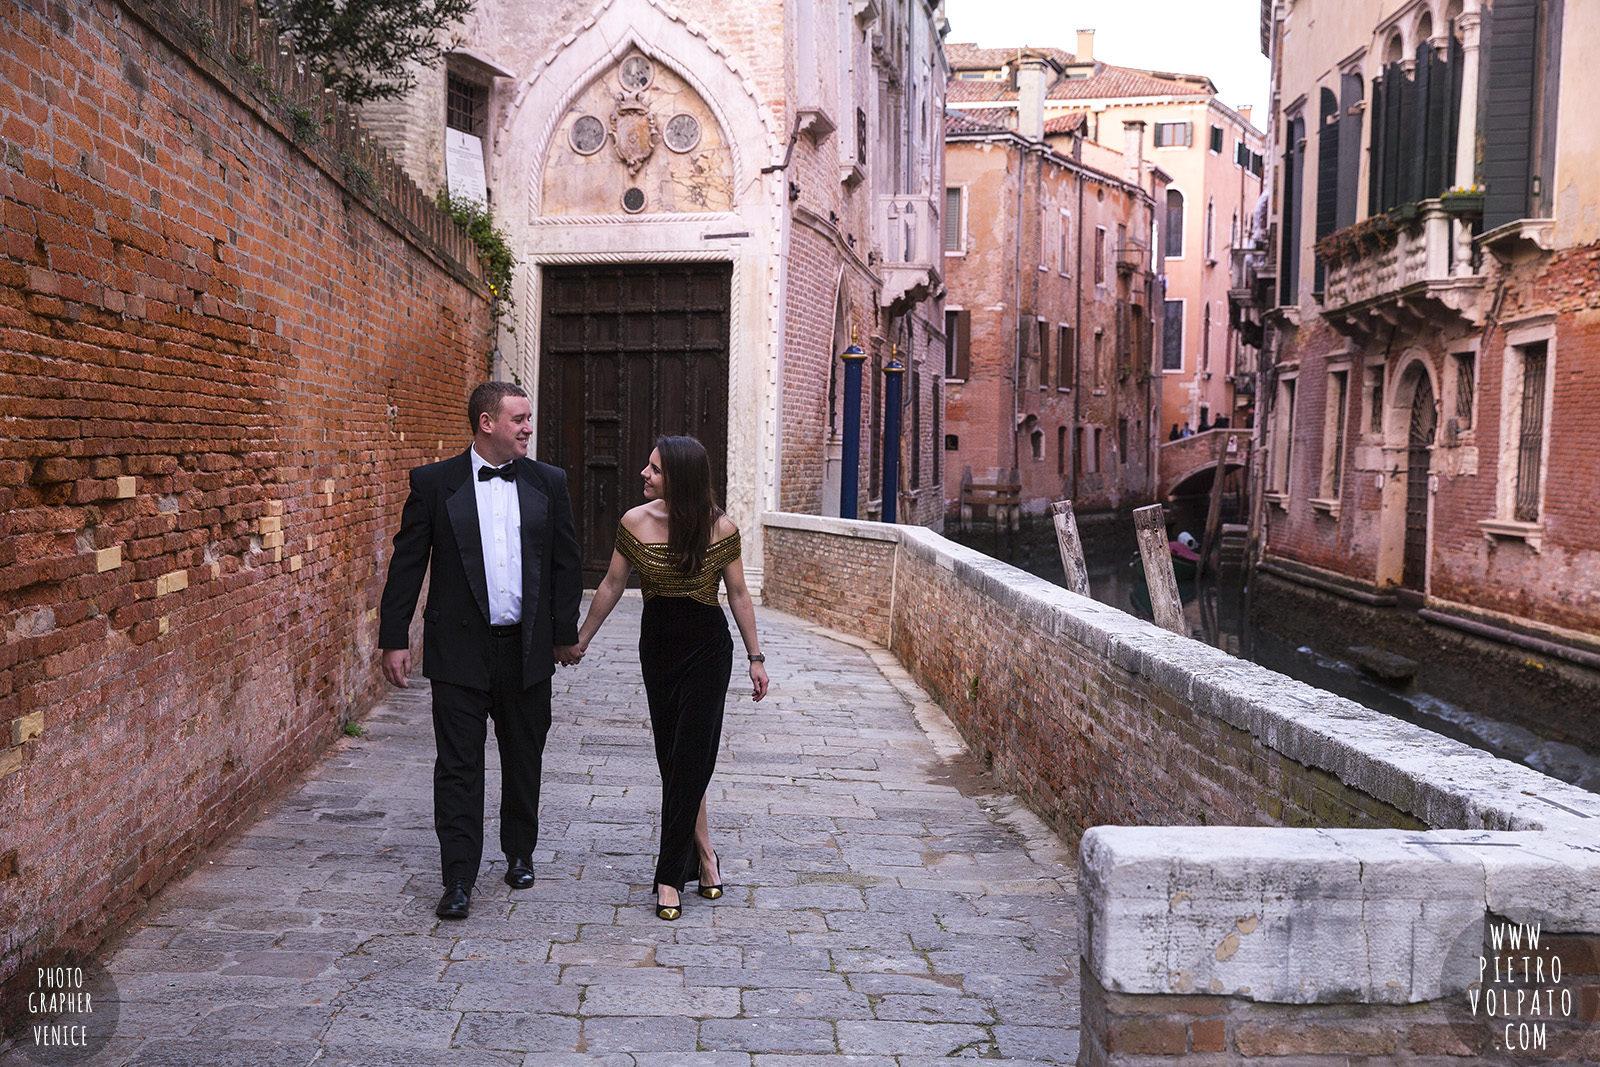 pre-wedding-love-story-photoshoot-in-venice-italy-photographer-pietro-volpato-20161229_08